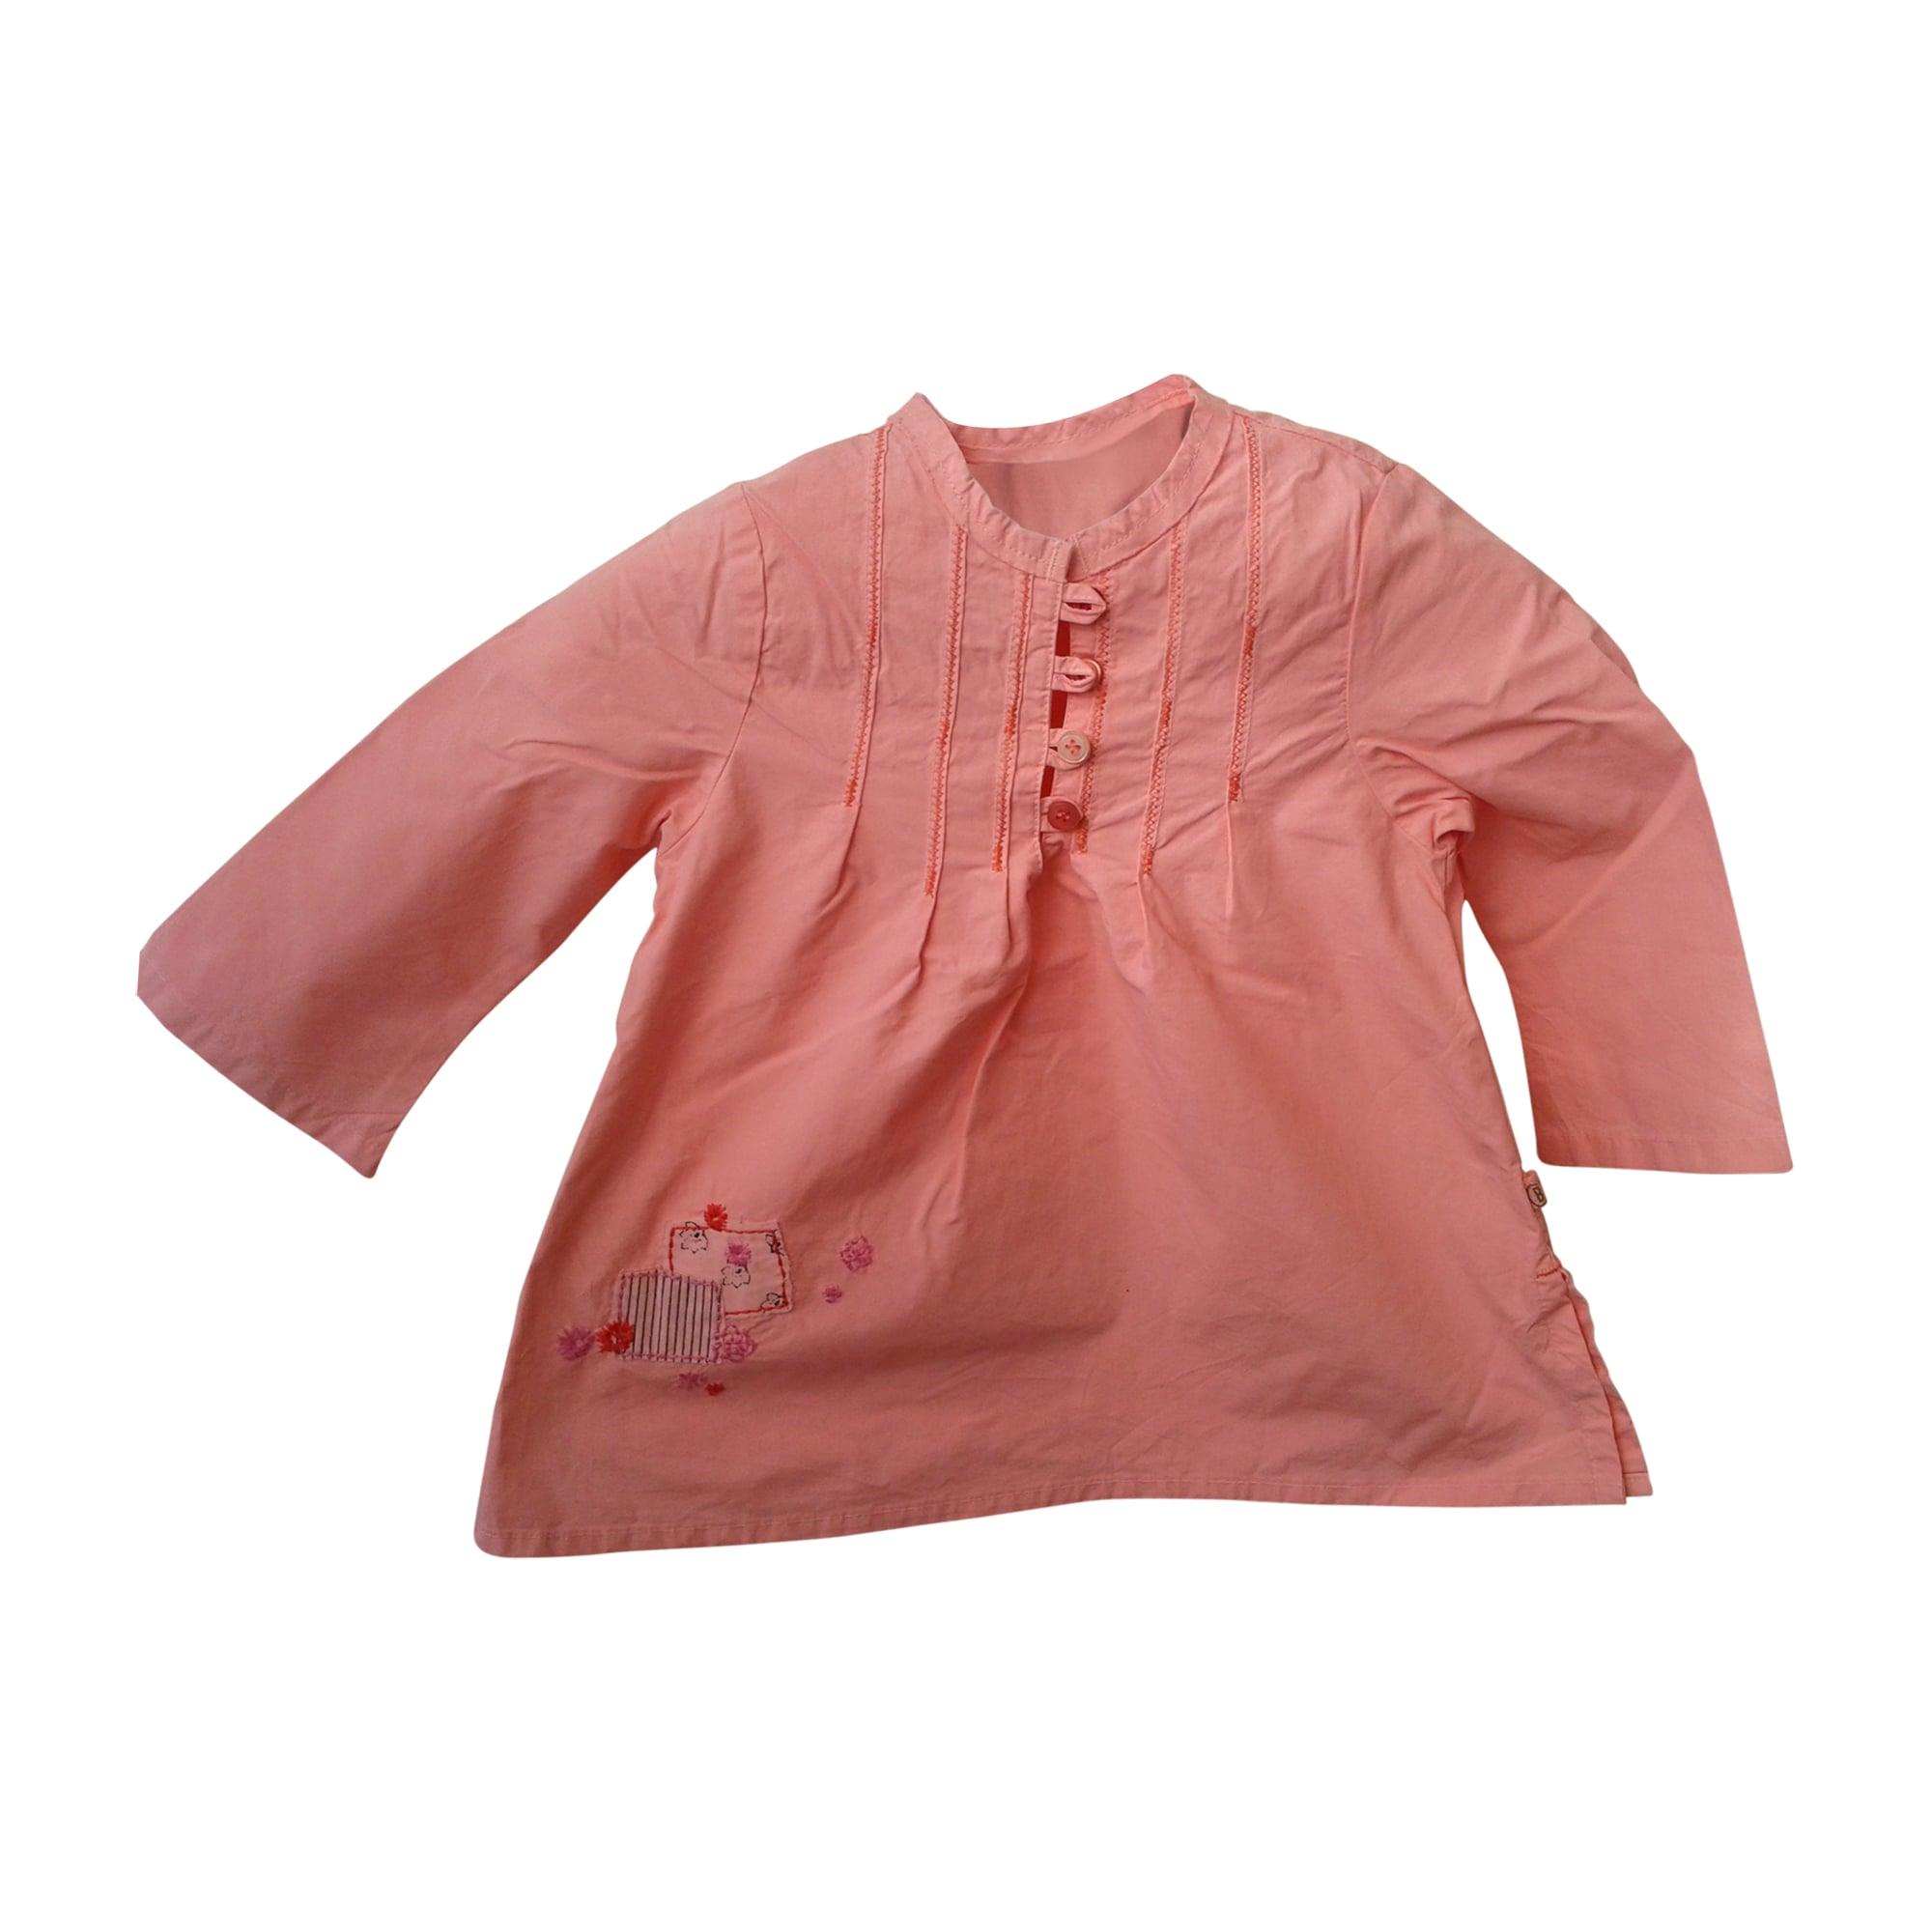 Top, tee shirt JEAN BOURGET Rose, fuschia, vieux rose